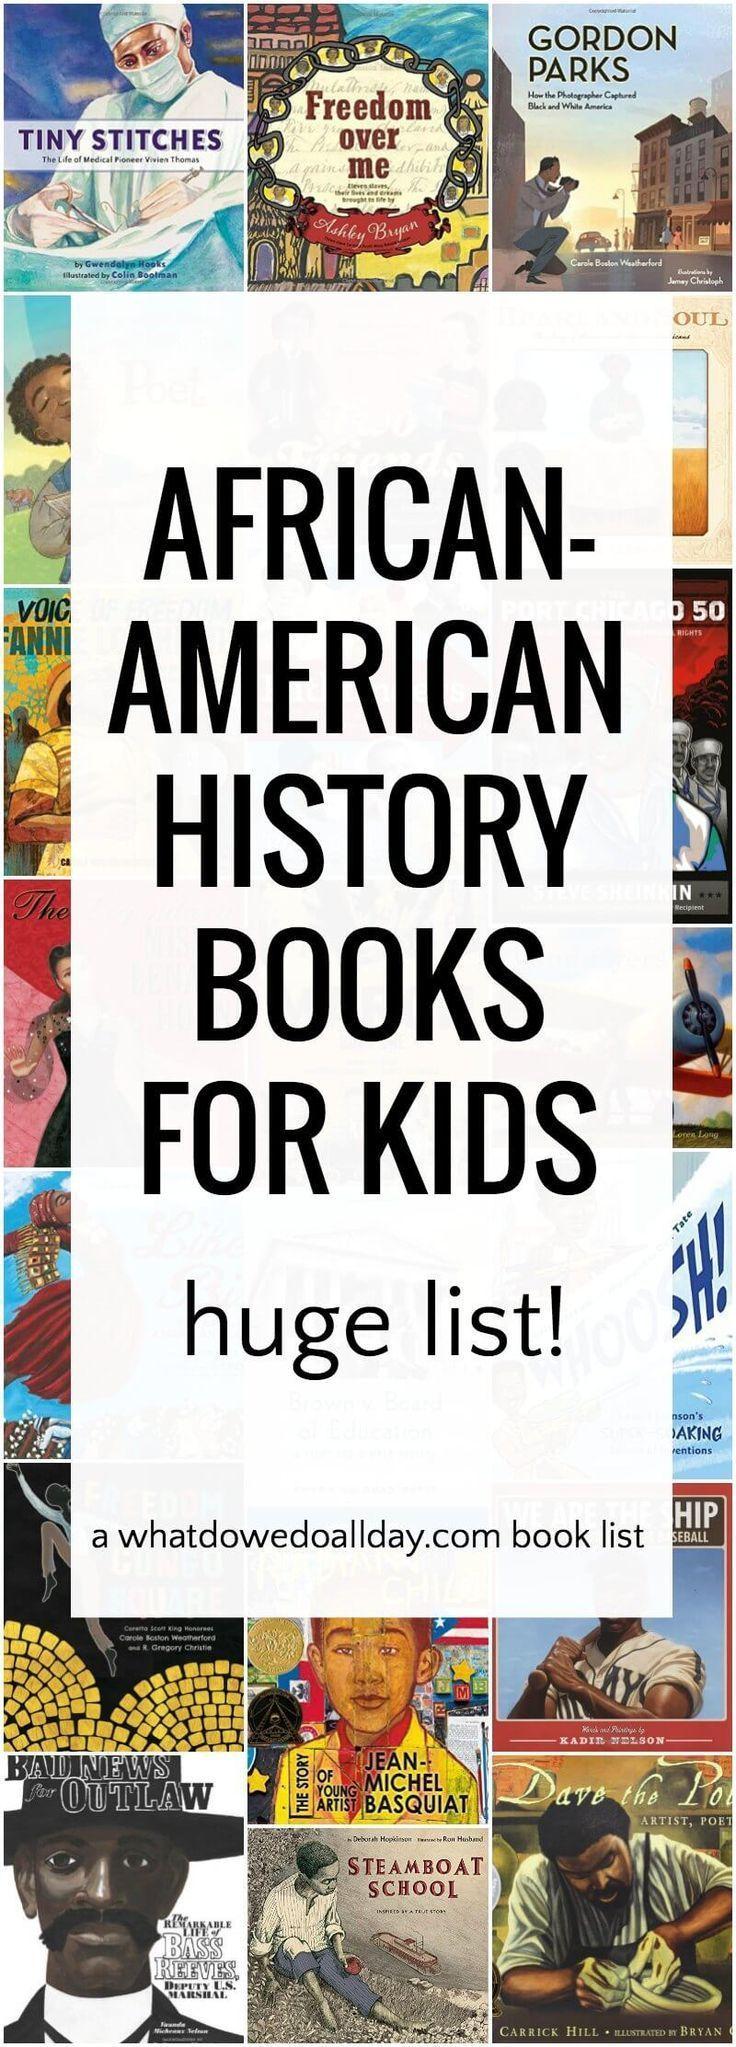 485 best books worth reading images on pinterest kid books